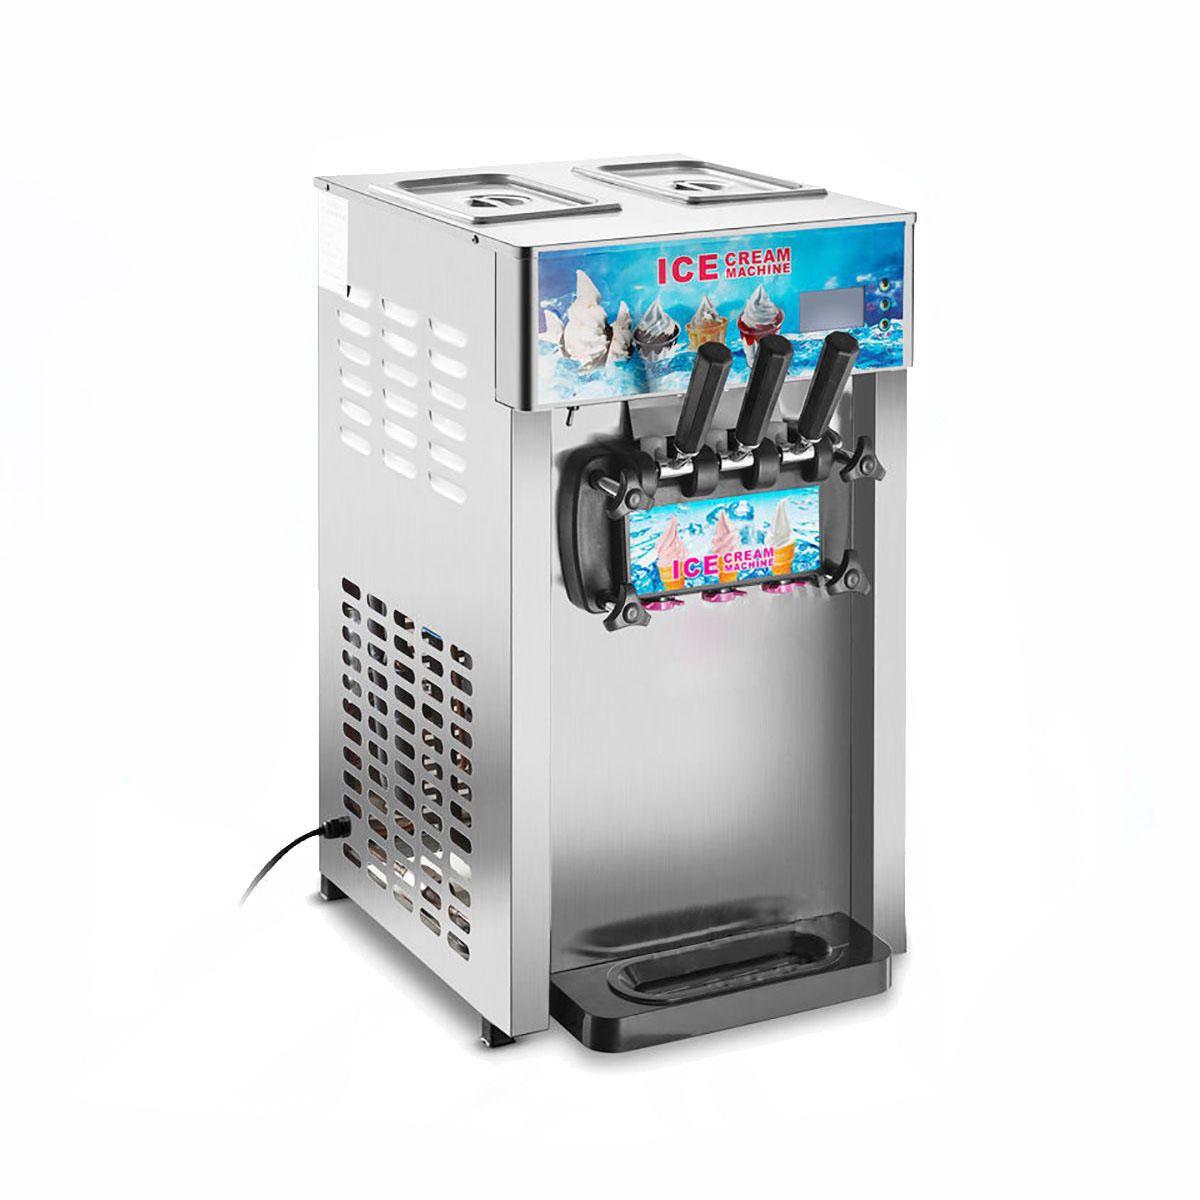 220v 1200w 3 Flavor Commercial Frozen Ice Cream Cones Machine Soft